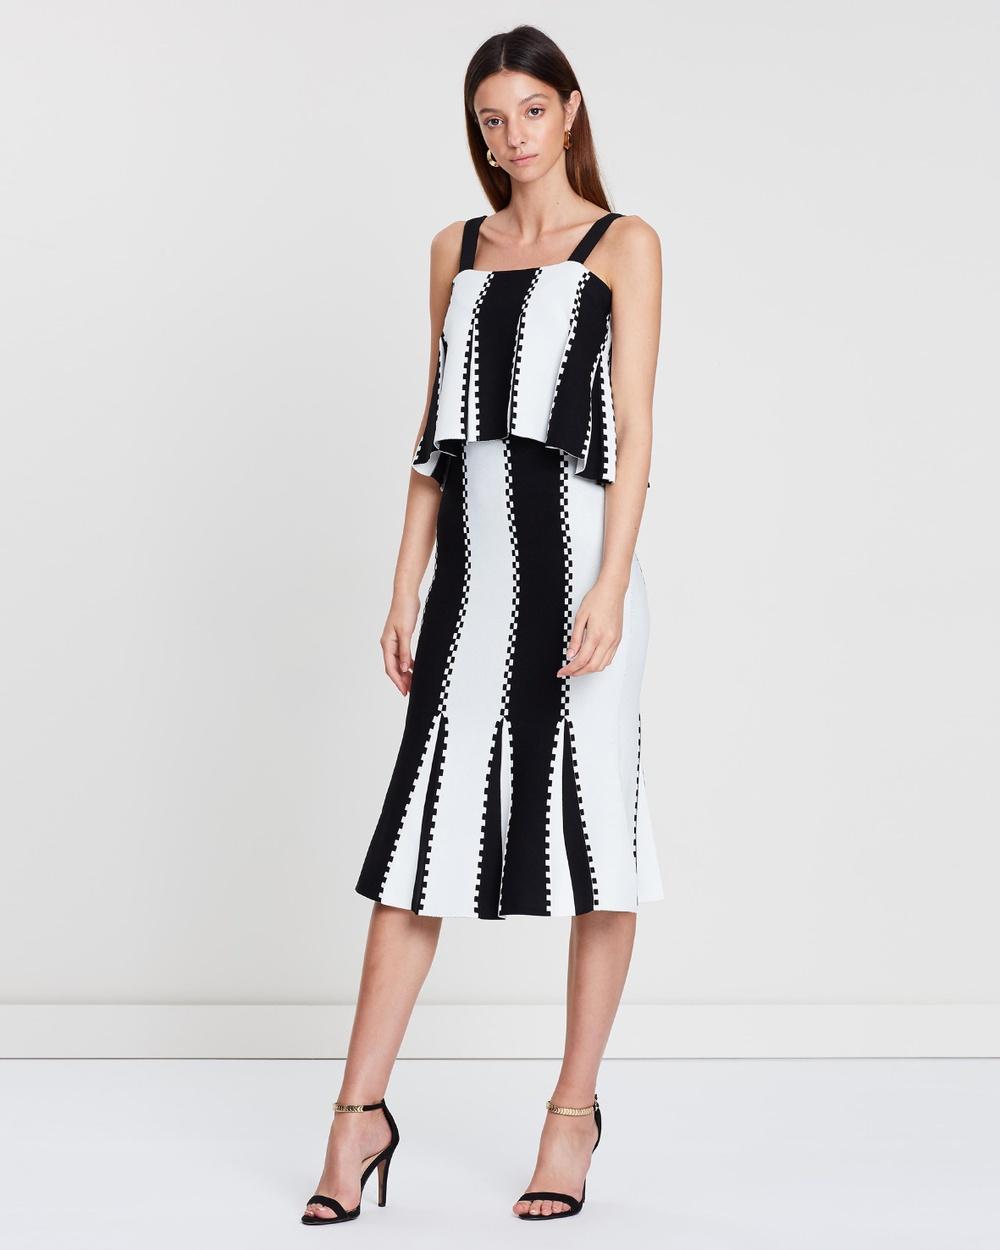 Sass & Bide Black & White Letter From Paris Knit Dress